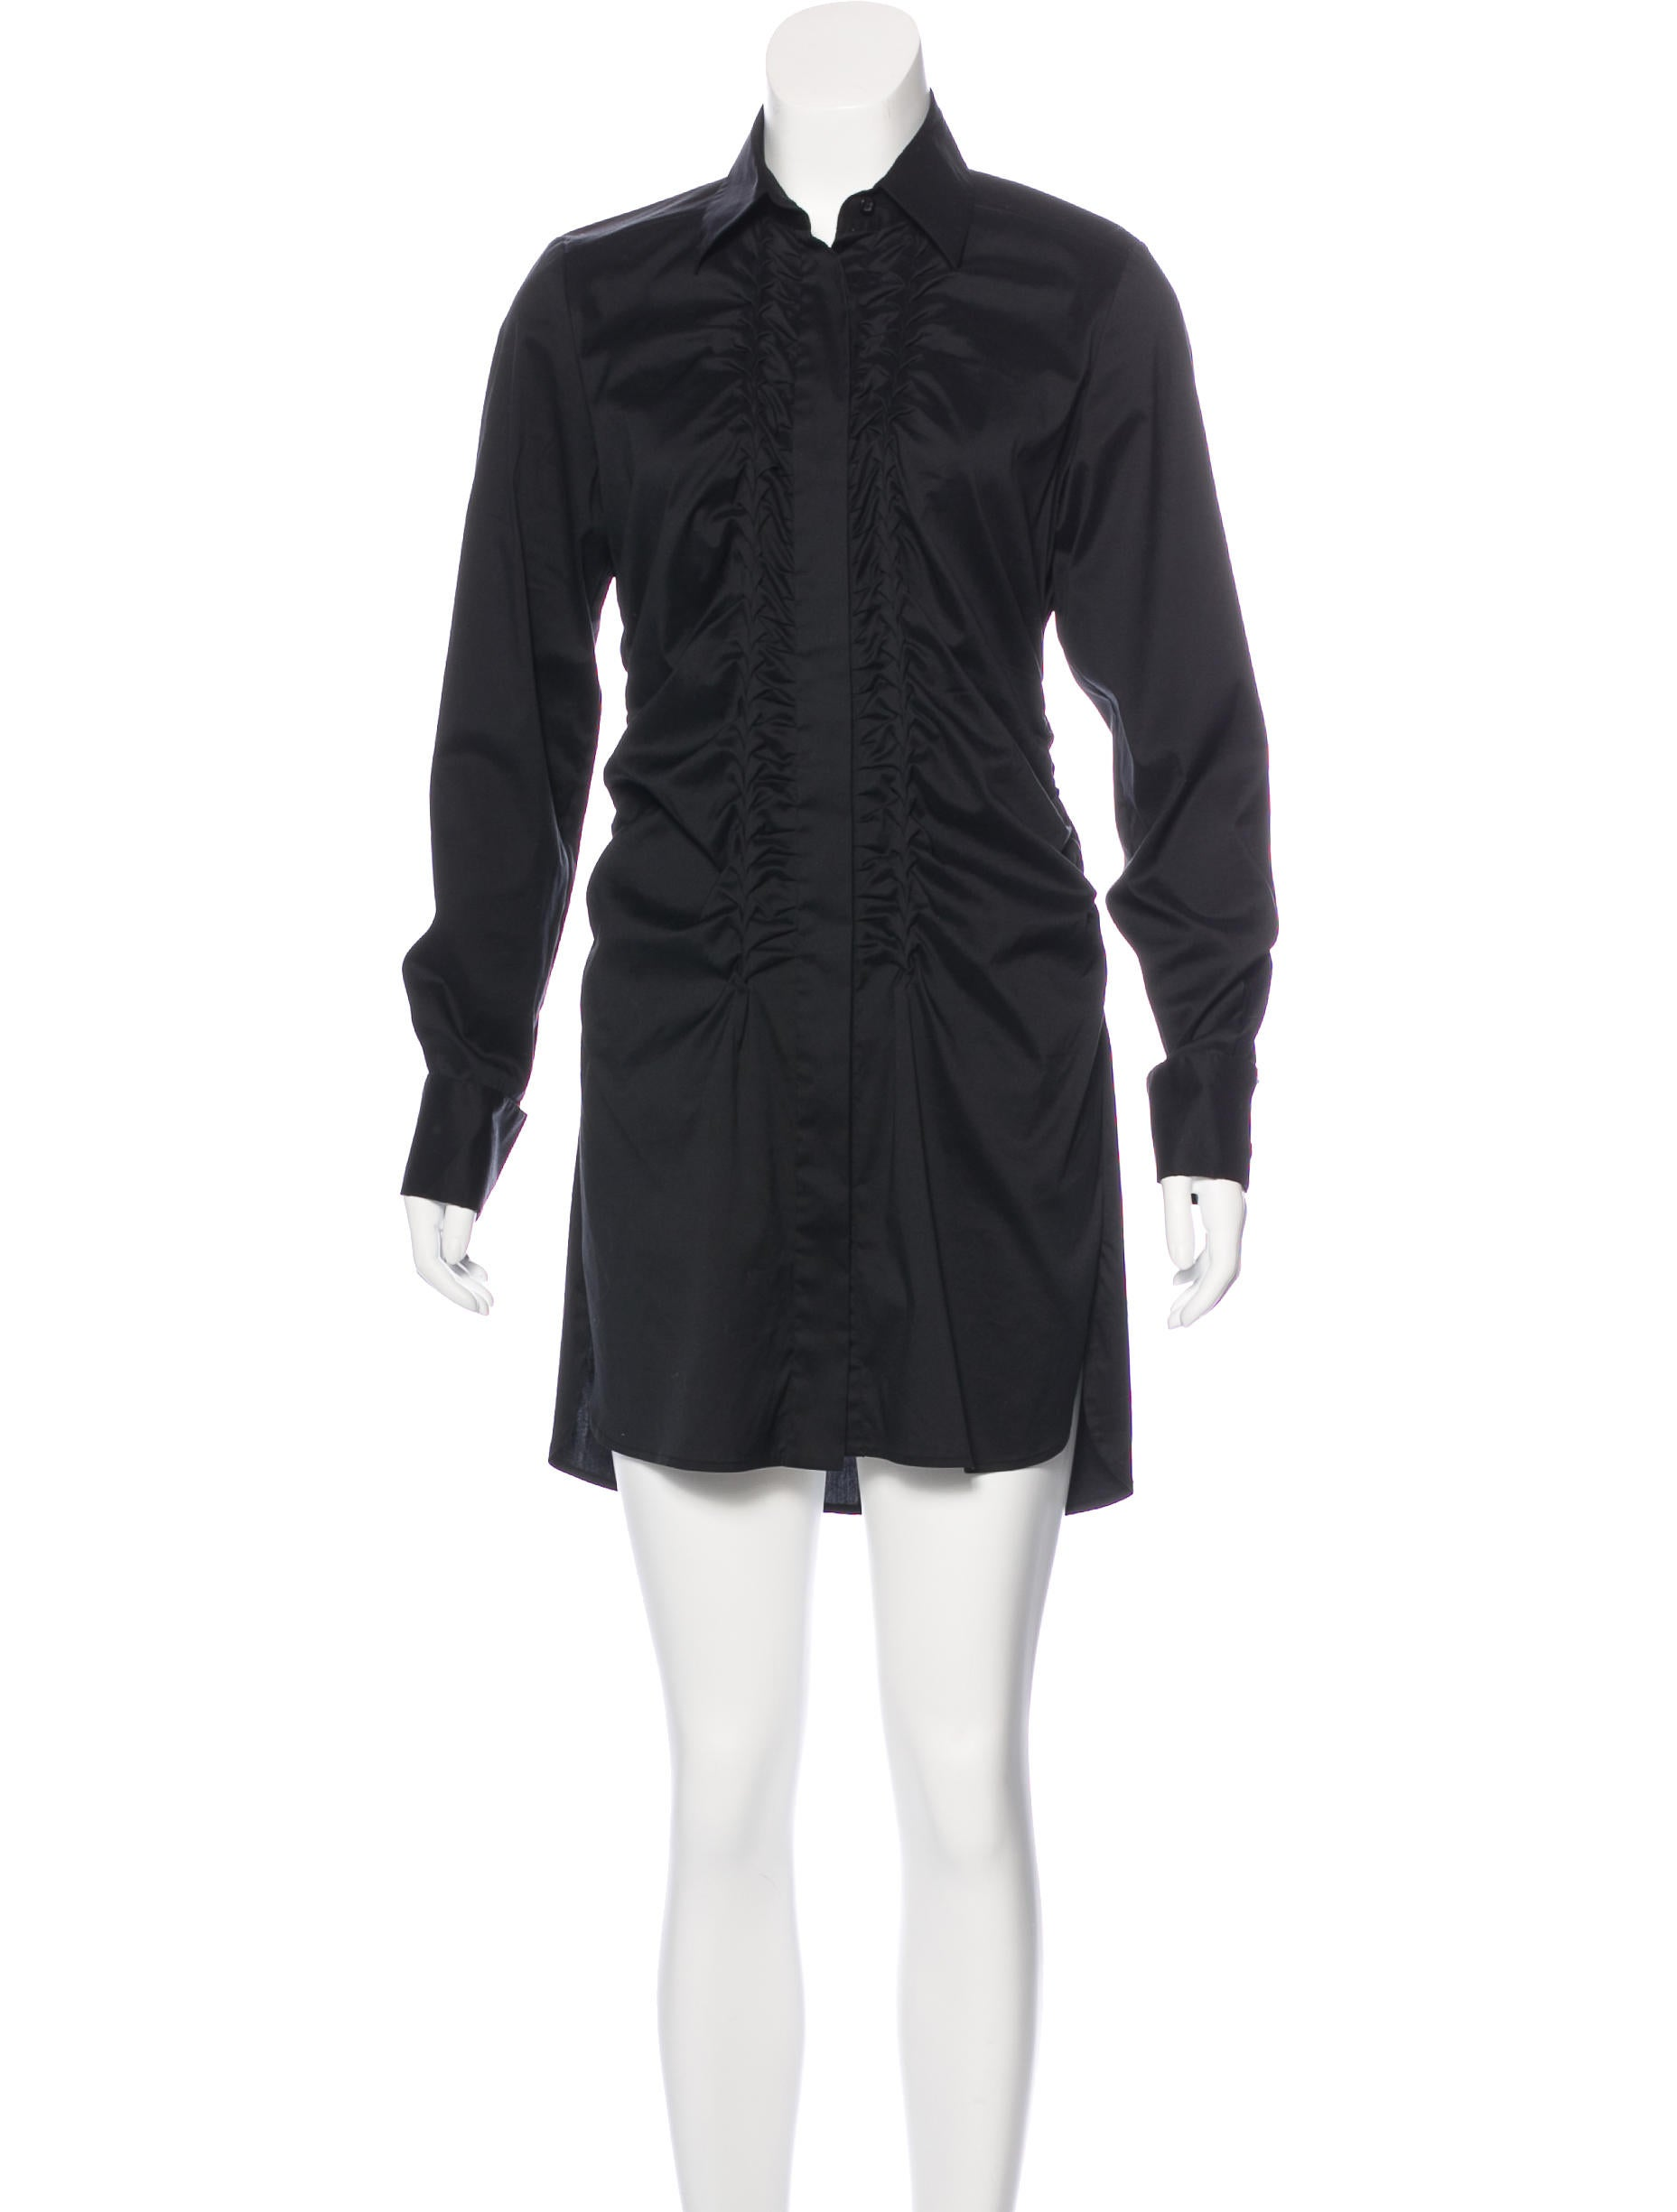 Robert Rodriguez Mini Shirt Dress Clothing Wrr29669 The Realreal